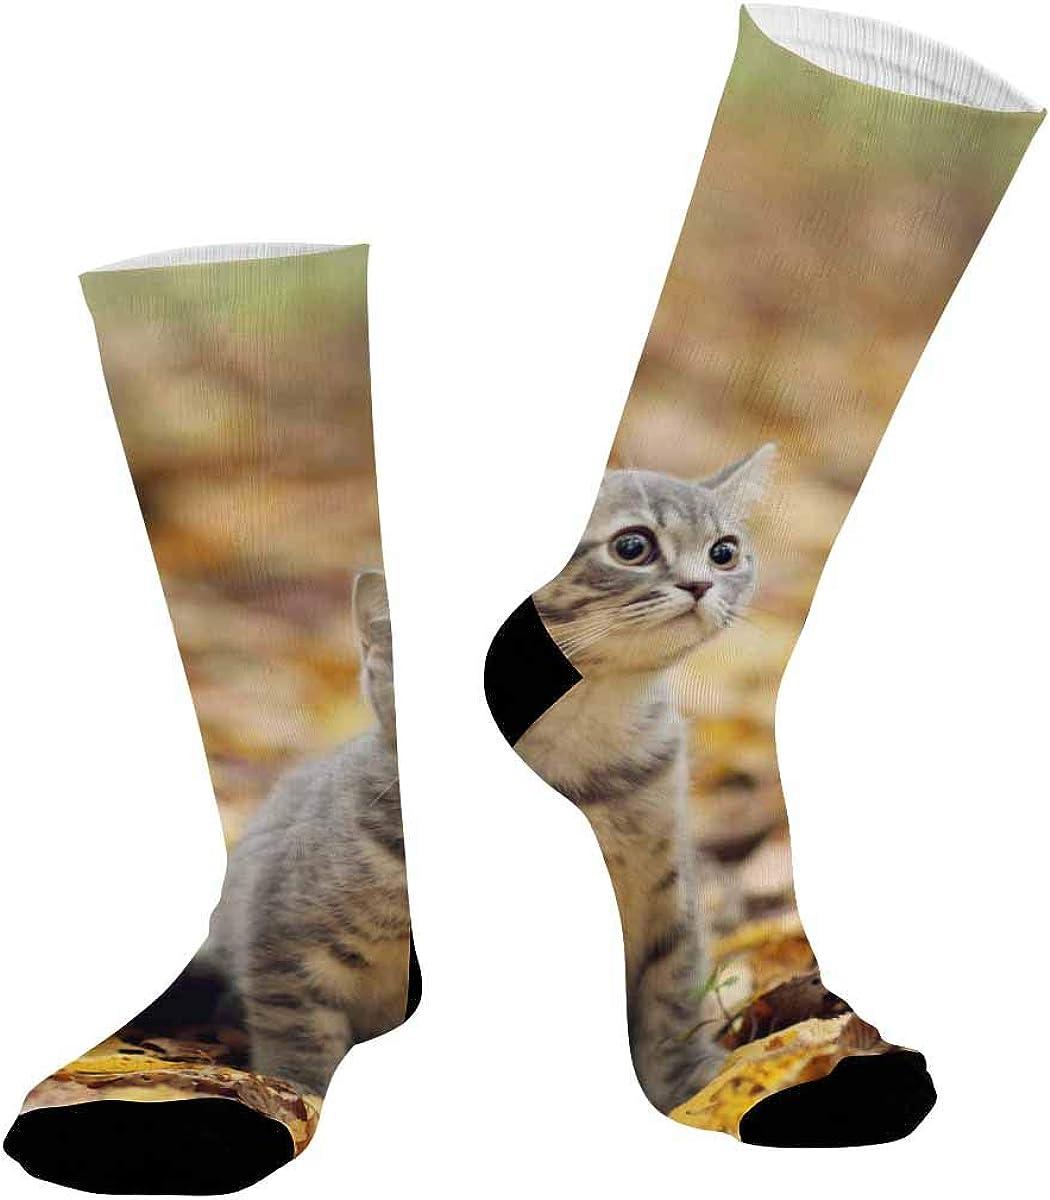 INTERESTPRINT Sublimated Hiking Dress Athletic Crew Socks Kitten Autumn Leaves Cat